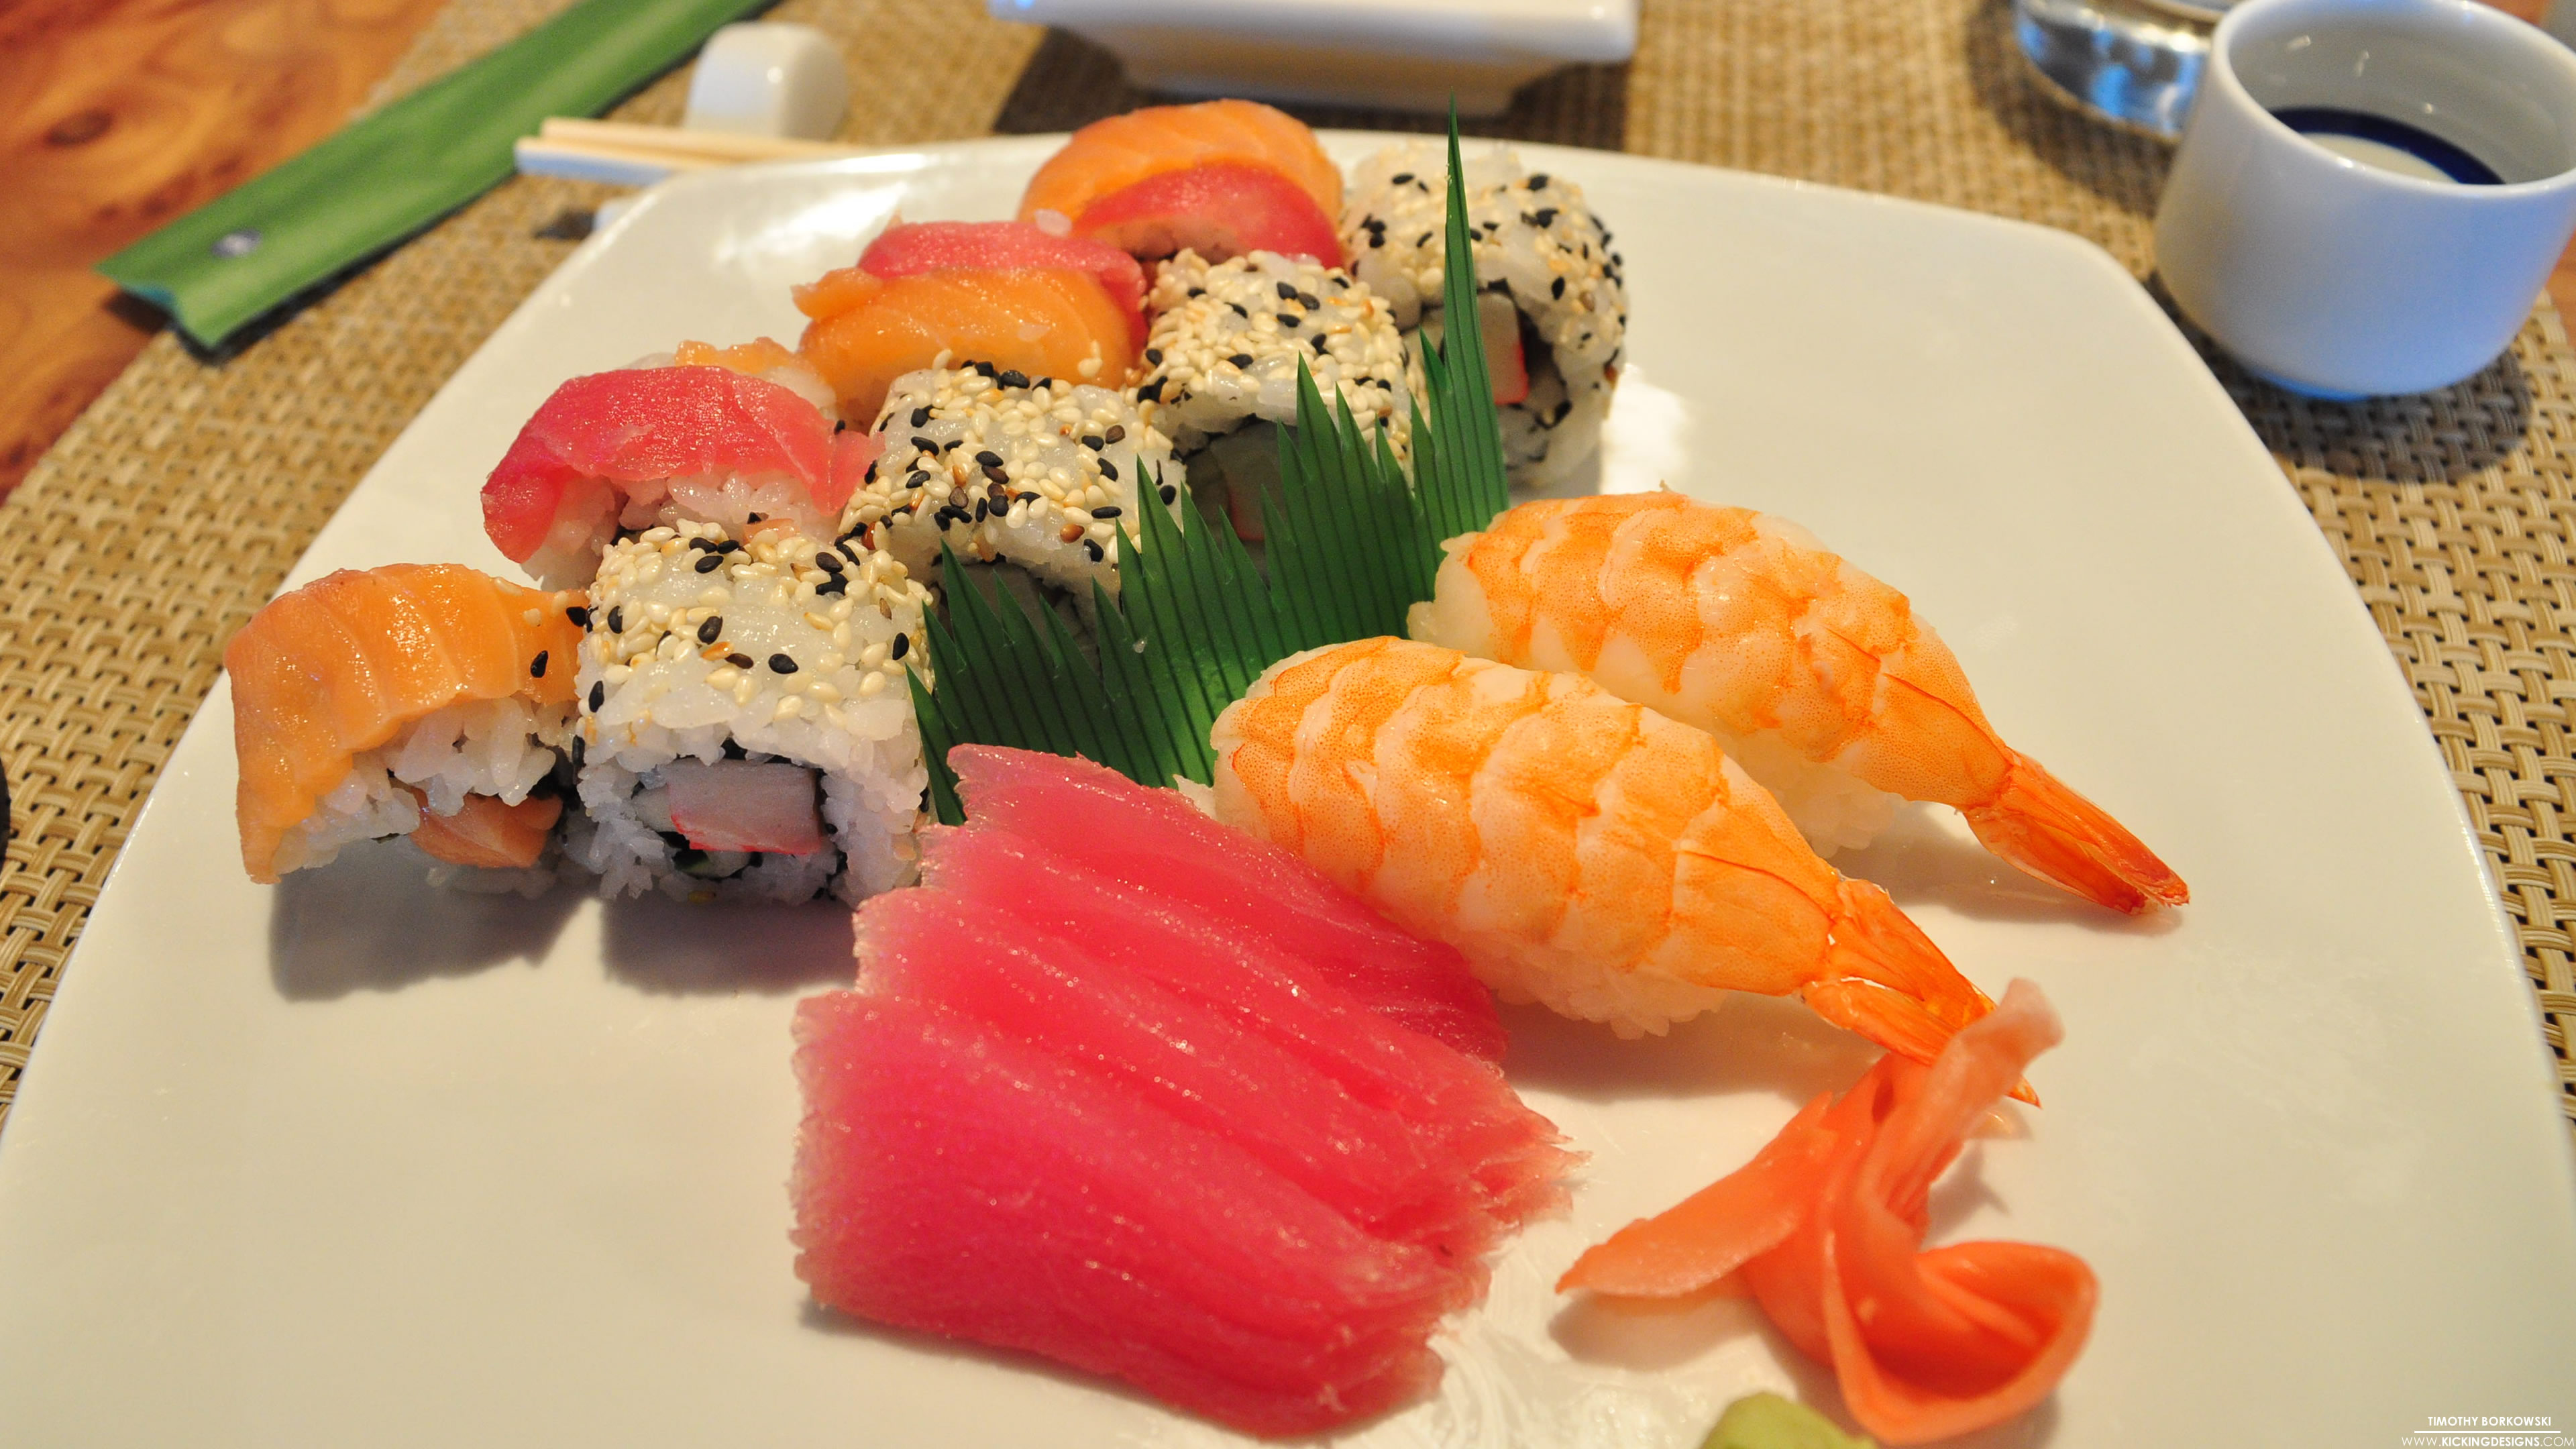 Plate of Sushi 2-25-2014 Wallpaper Background | Kicking Designs